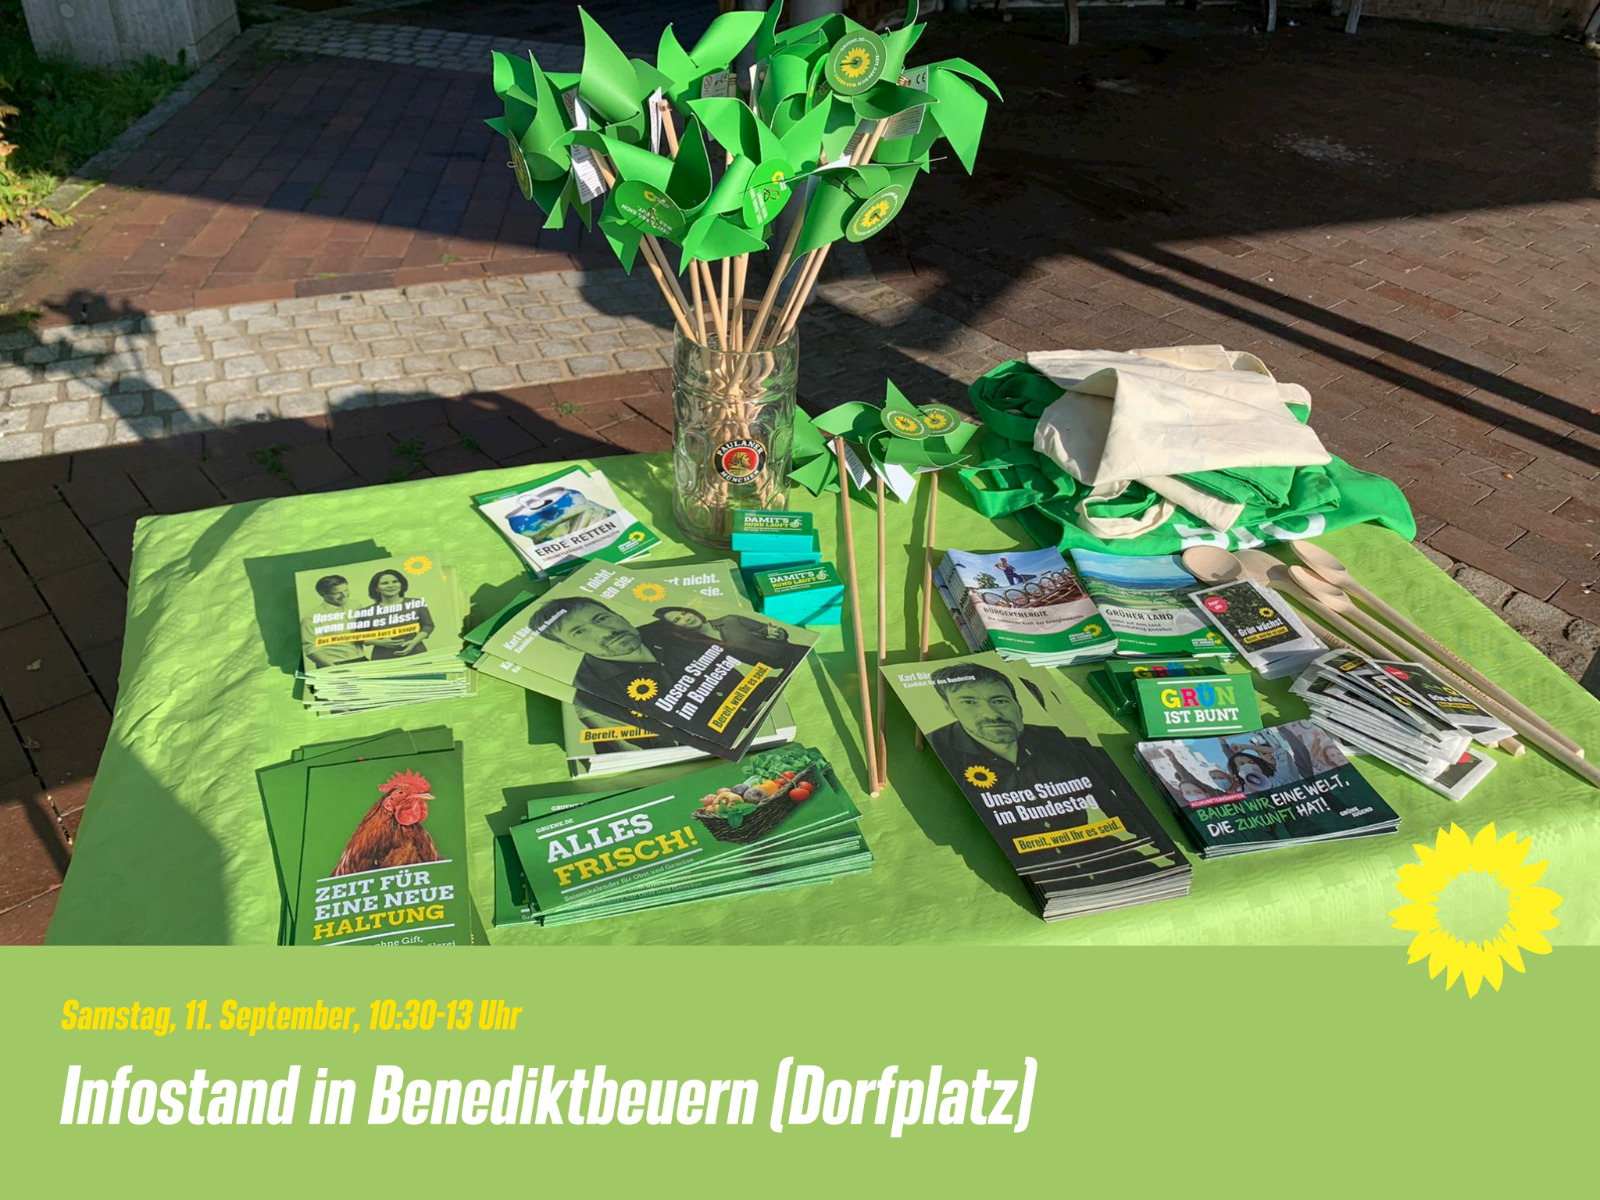 Infostand in Benediktbeuern